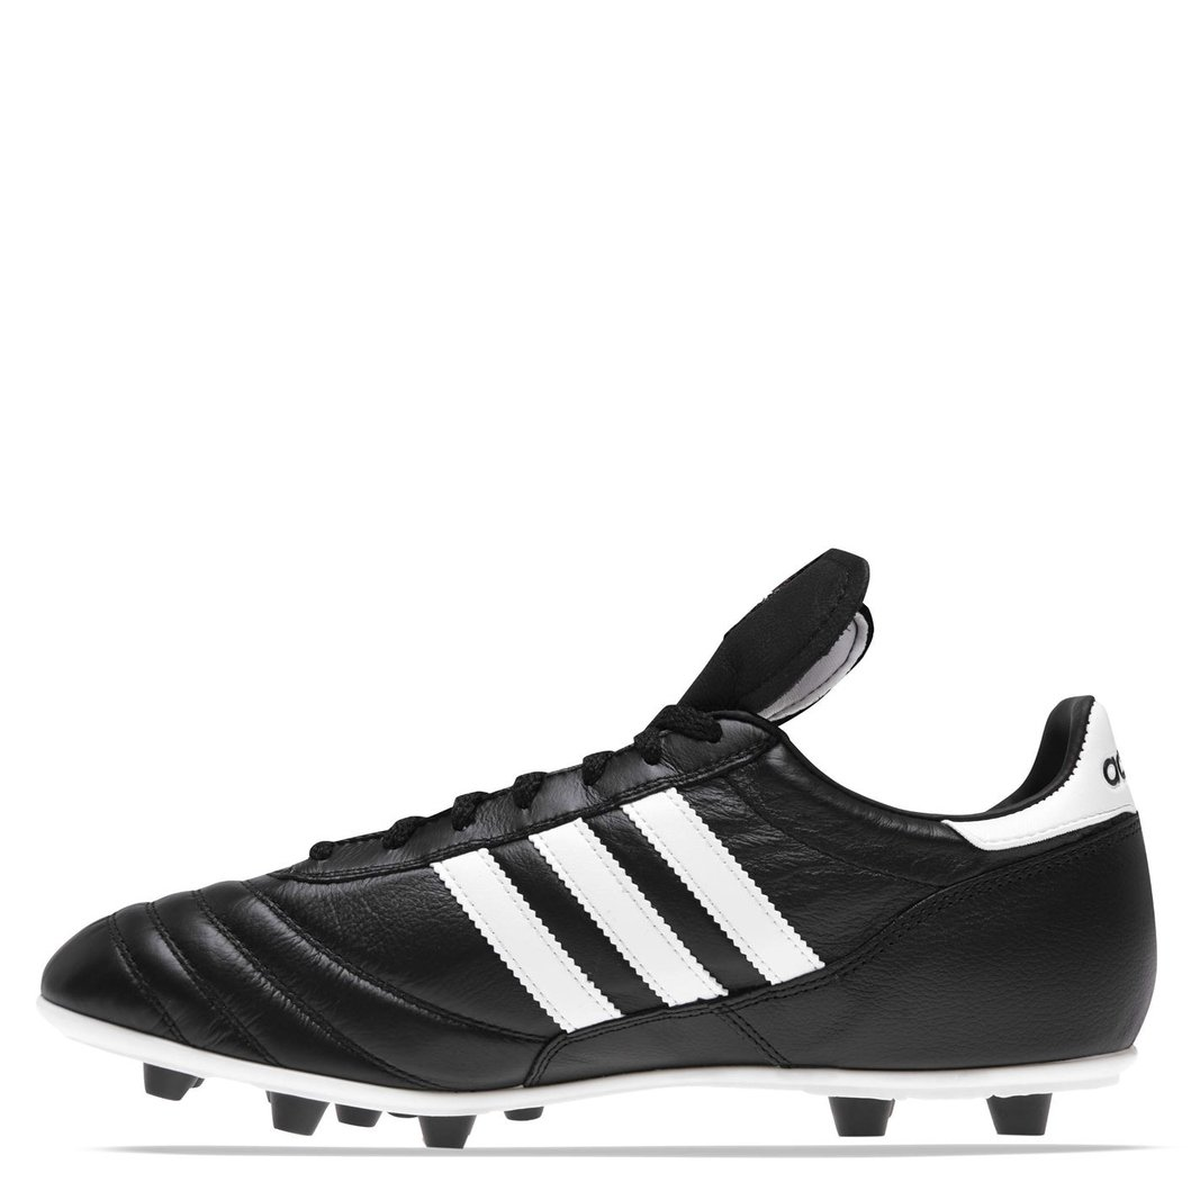 adidas Mens Copa Mundial Moulded FG Football Boots Shoe Footwear ... da2e4cffe87